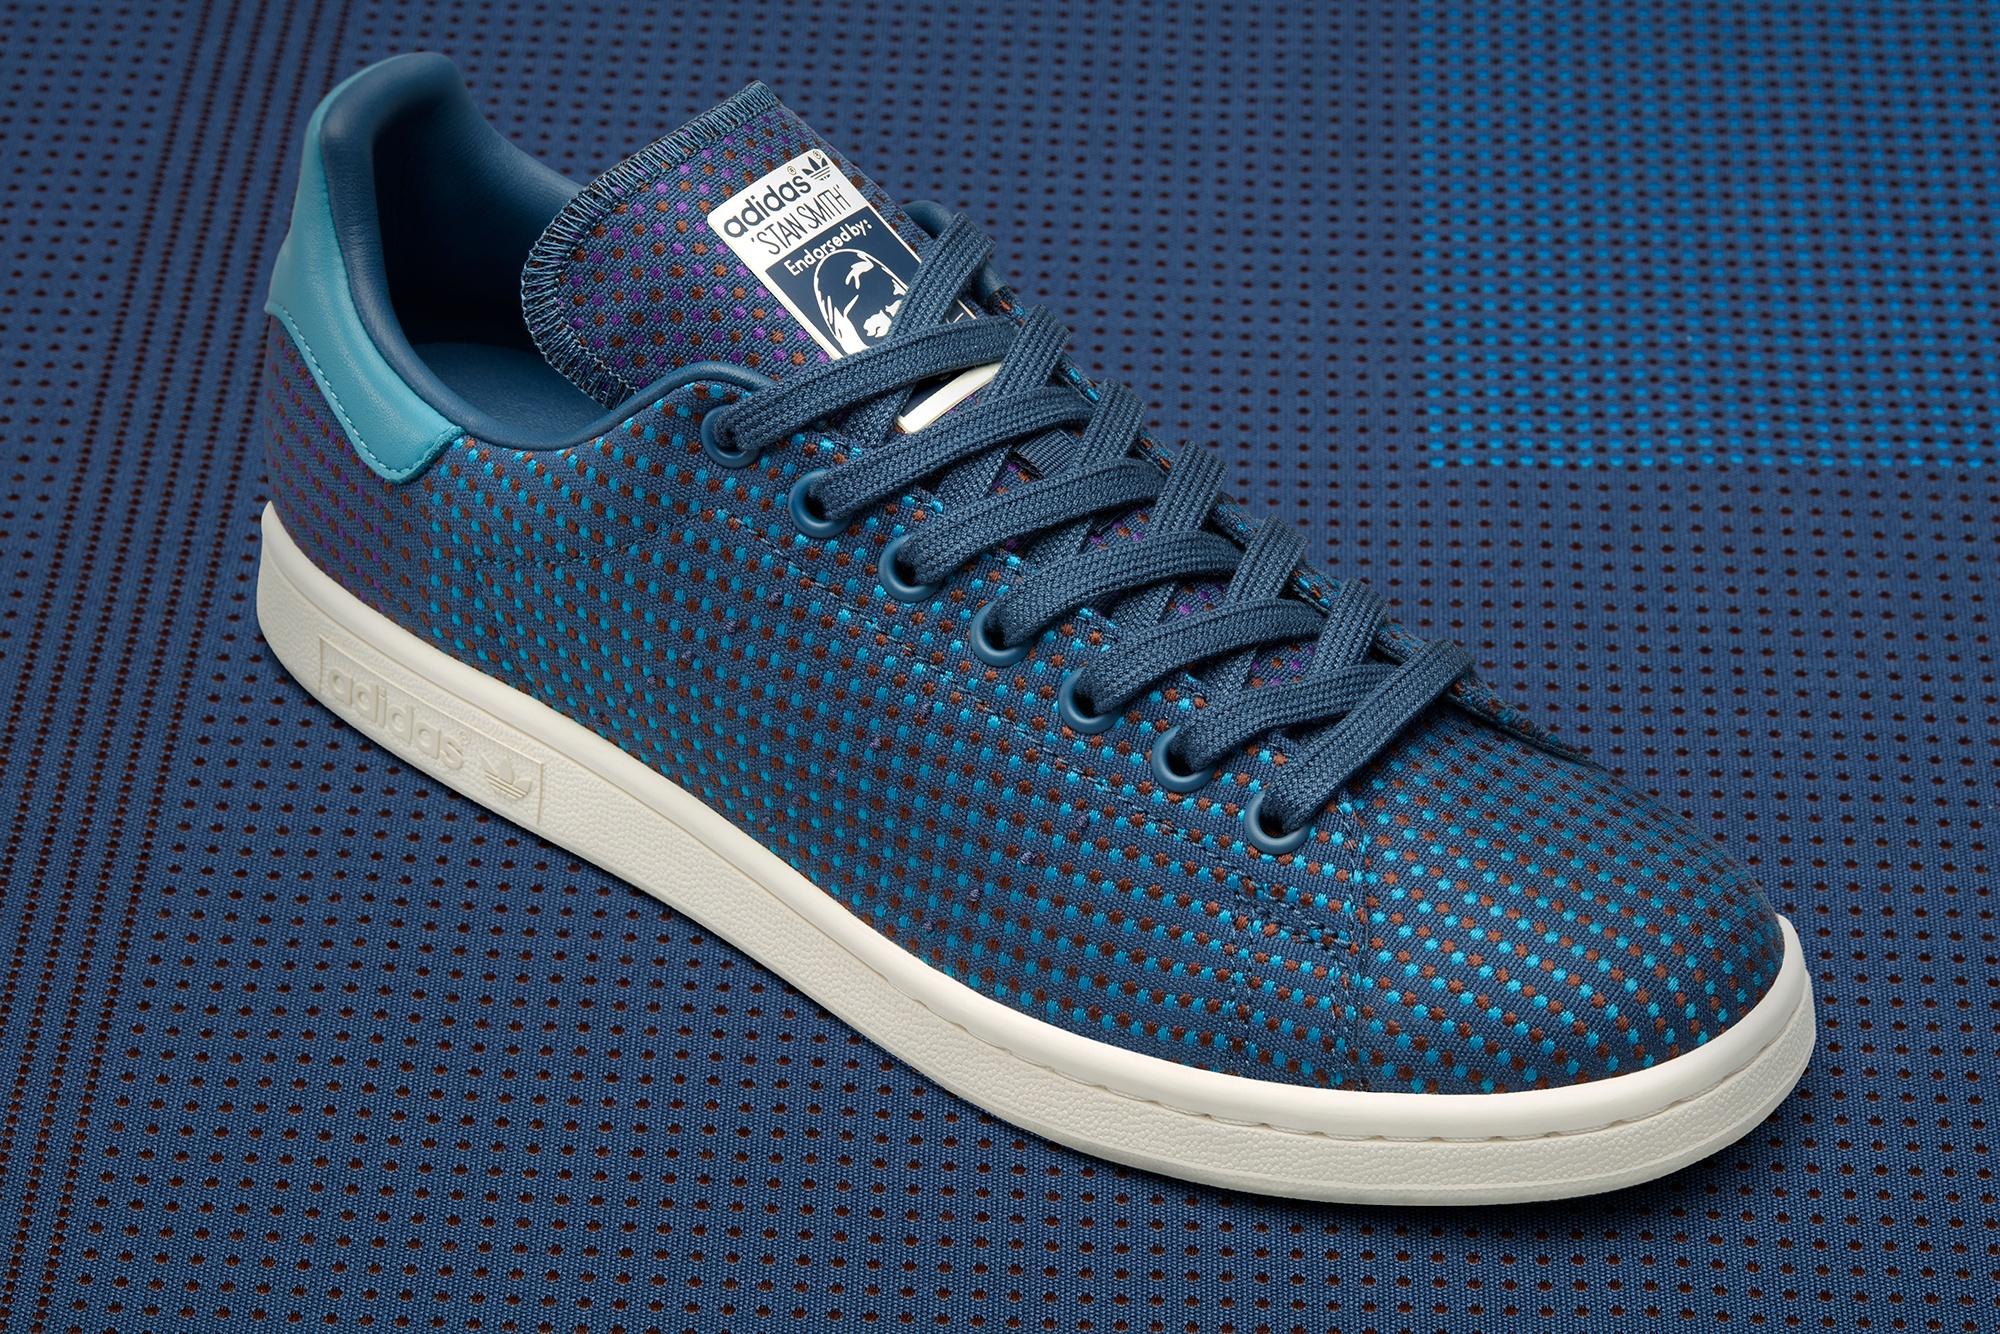 Adidas Originals Taps Kvadrat For Special Edition Stan Smiths